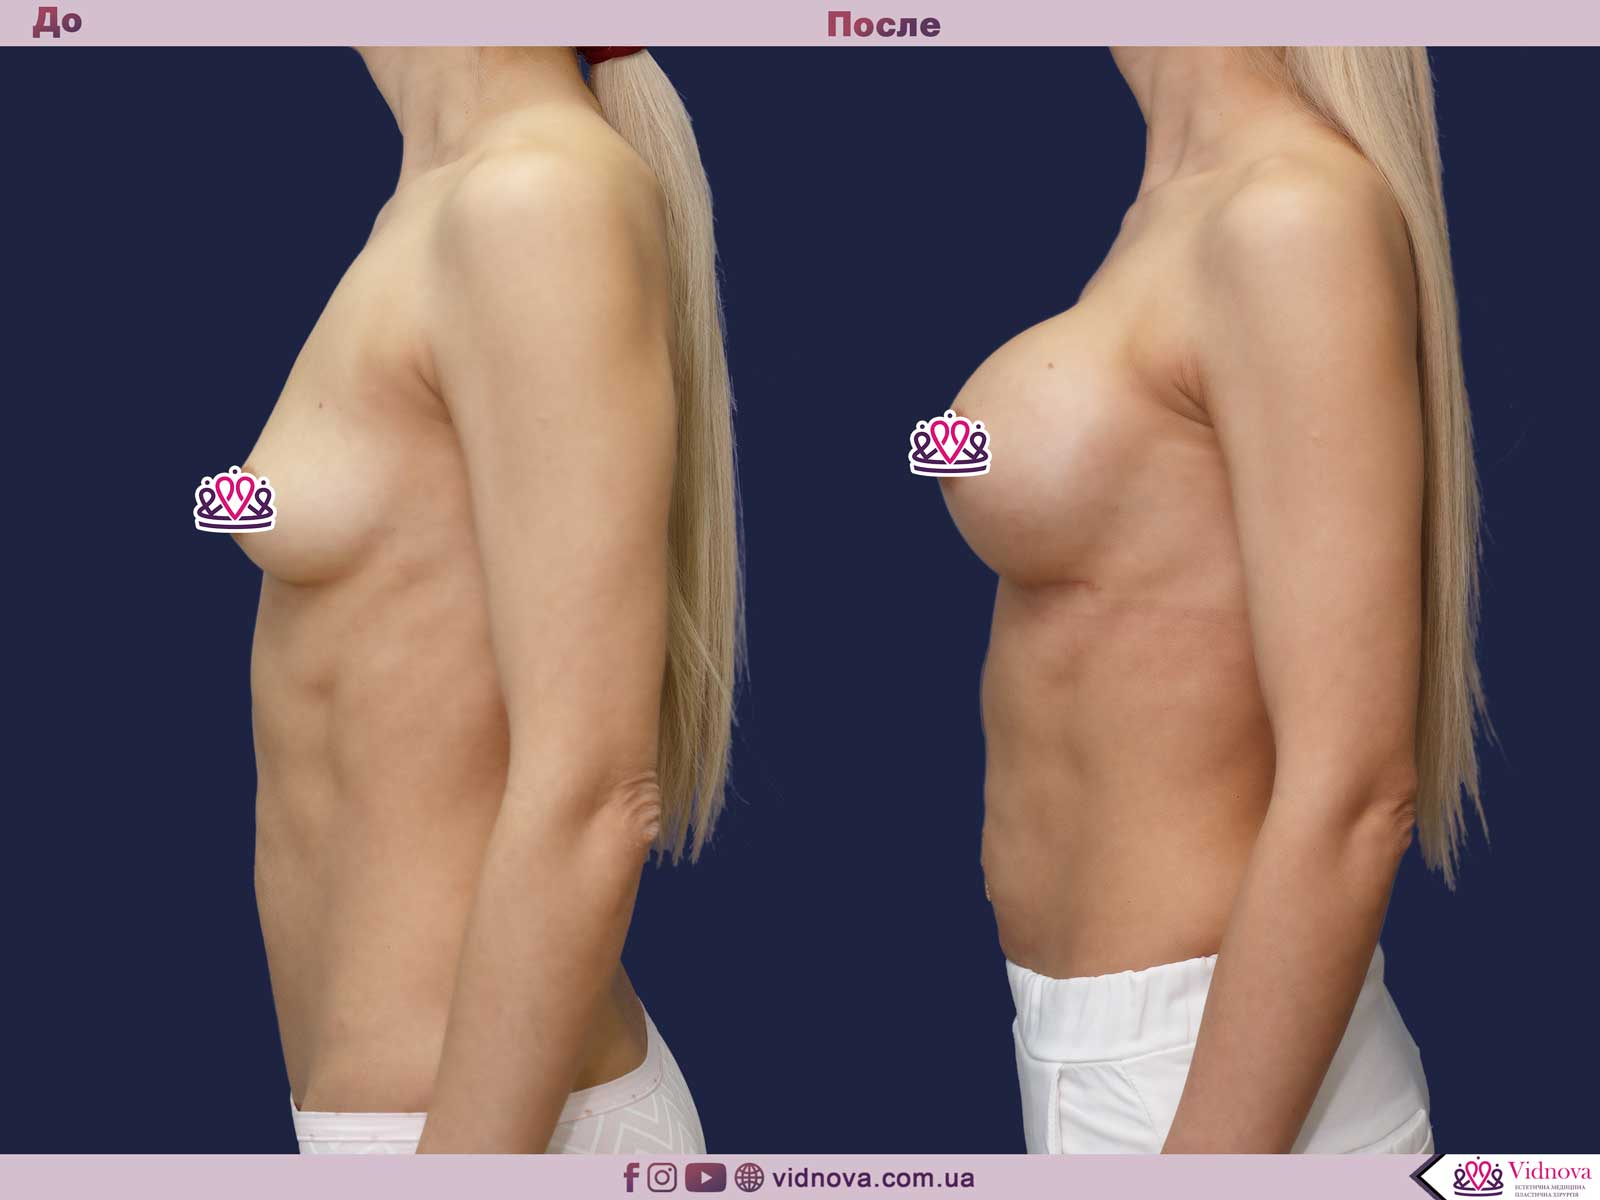 Увеличение груди: Фото ДО и ПОСЛЕ - Пример №69-3 - Клиника Vidnova